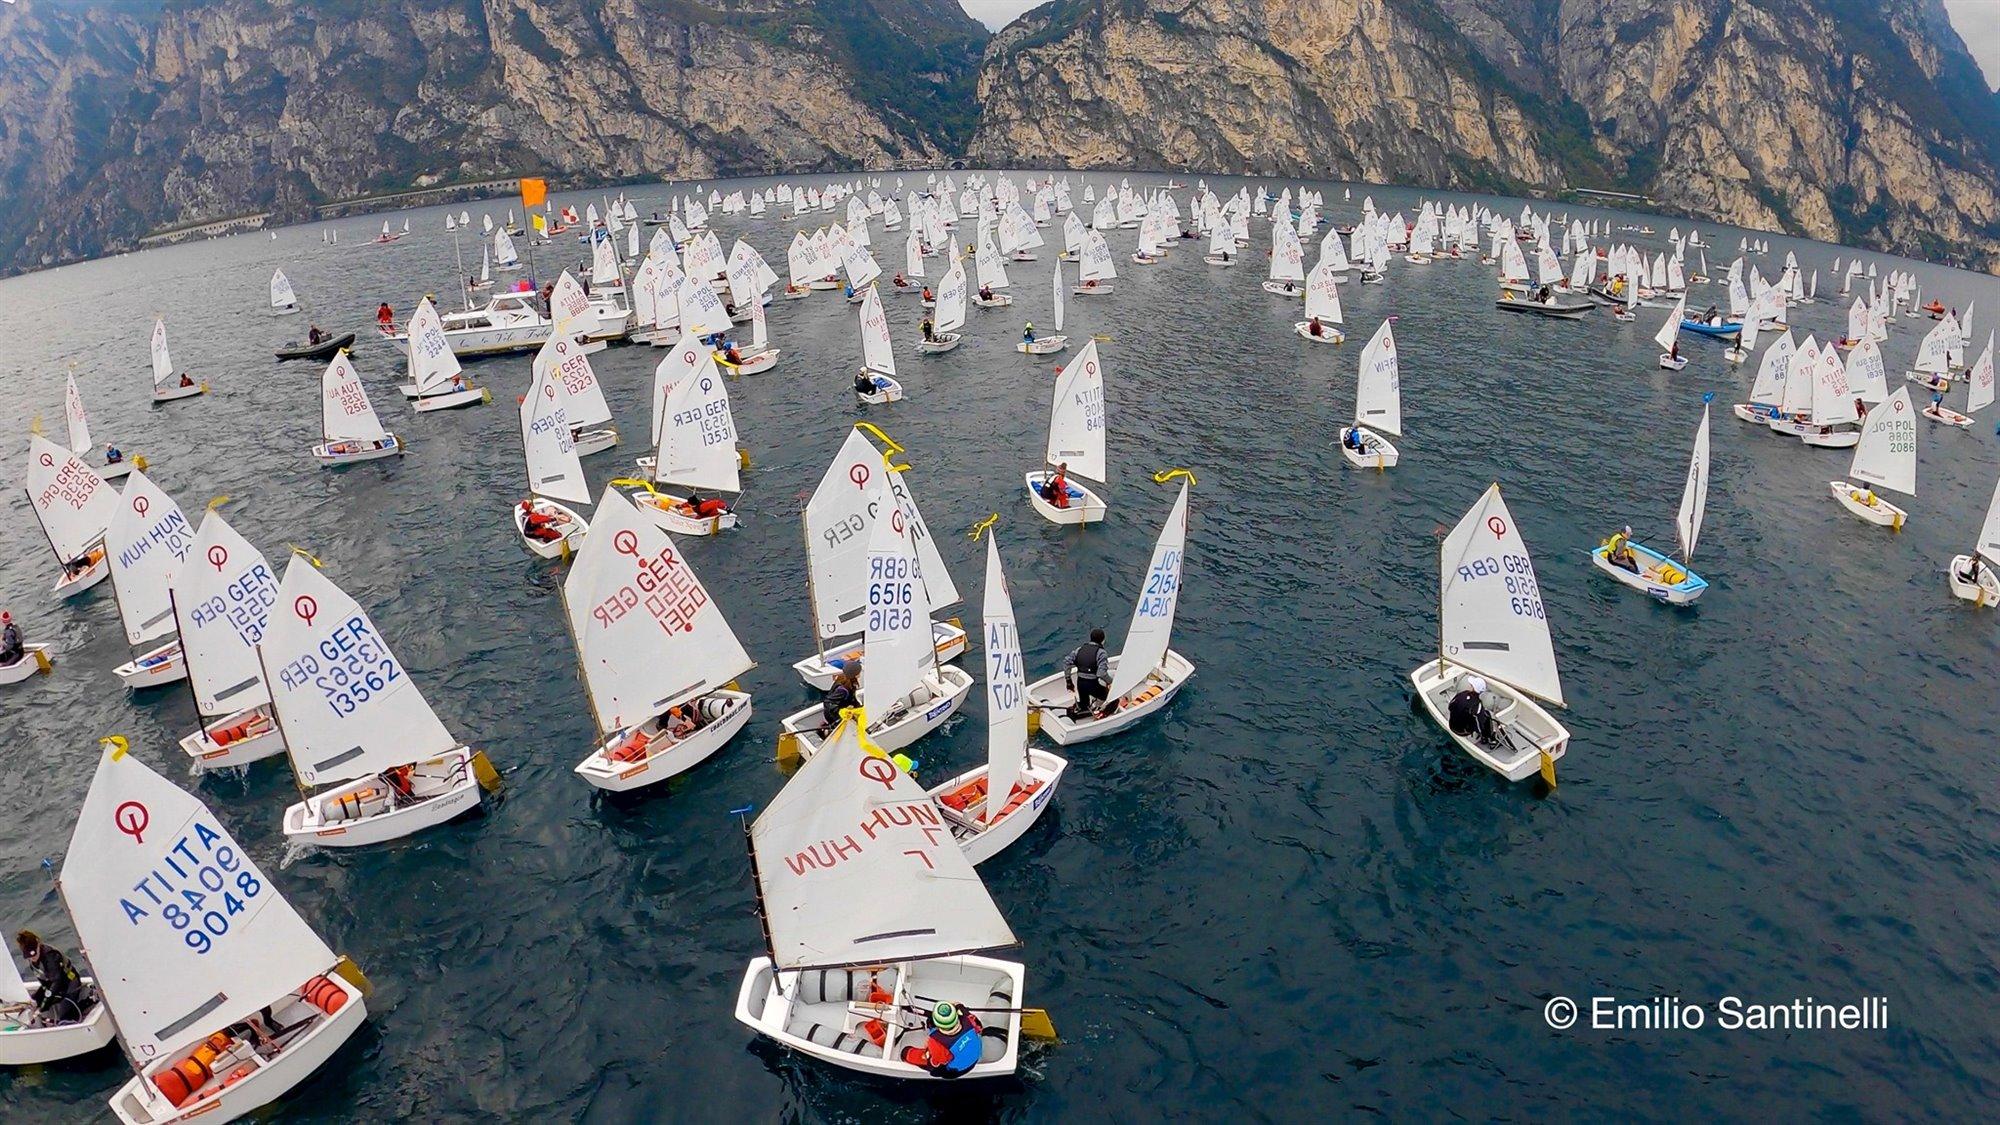 Regattas Sailing Courses Nautical Licenses And Boat Rentals On Lake Garda Circolo Vela Torbole